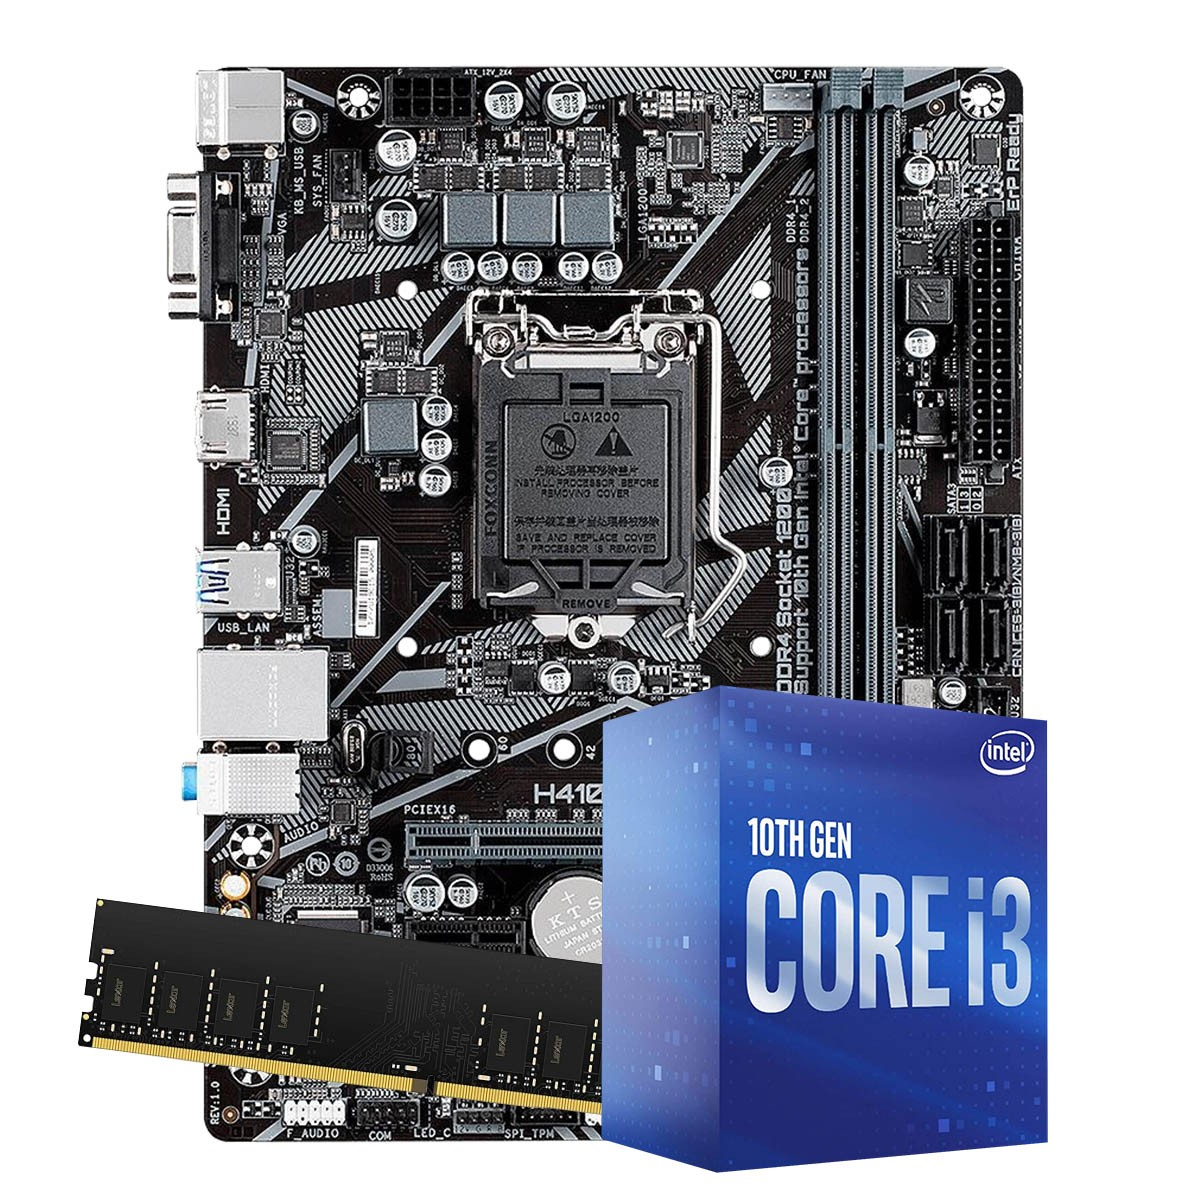 Kit Upgrade intel 10º geração Core i3-10100 3.6ghz ,Placa Mãe Pcware H410 LGA 1200, 4GB DDR4